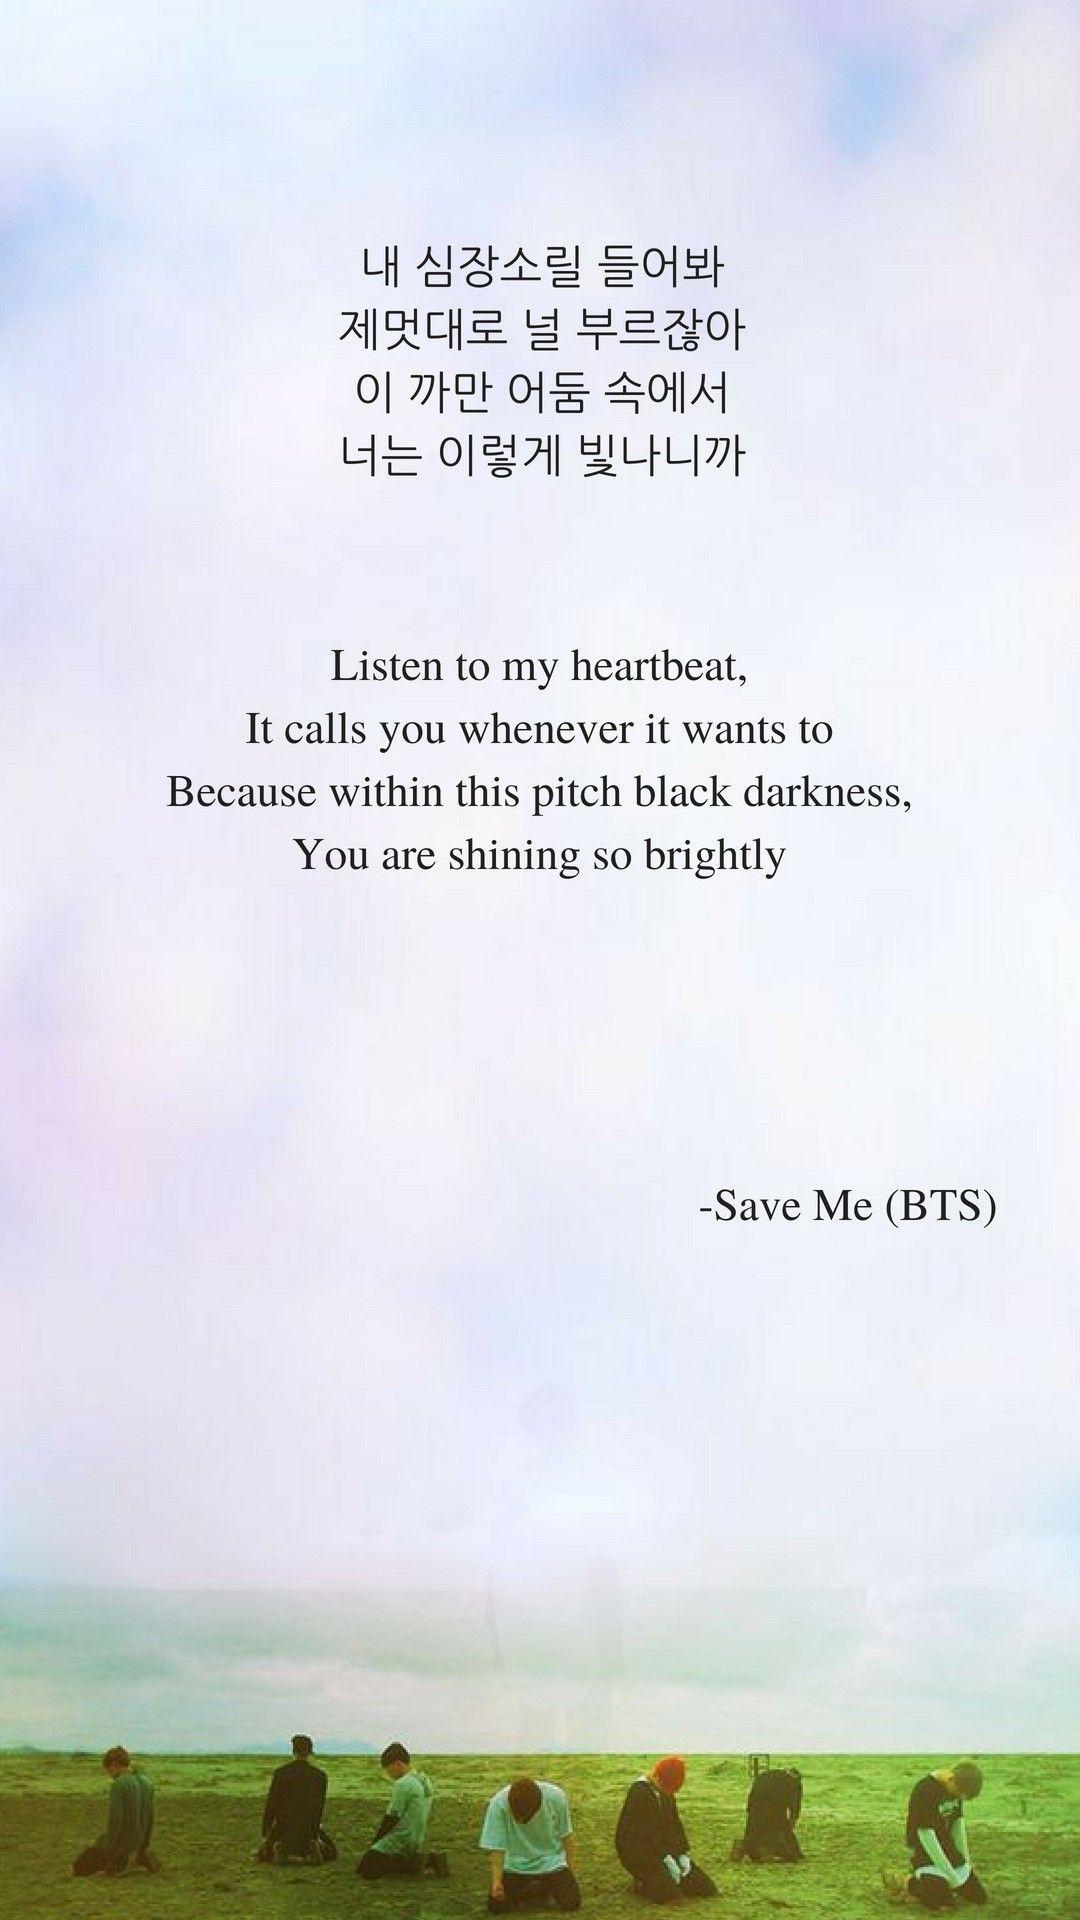 Save Me by BTS lyrics wallpaper